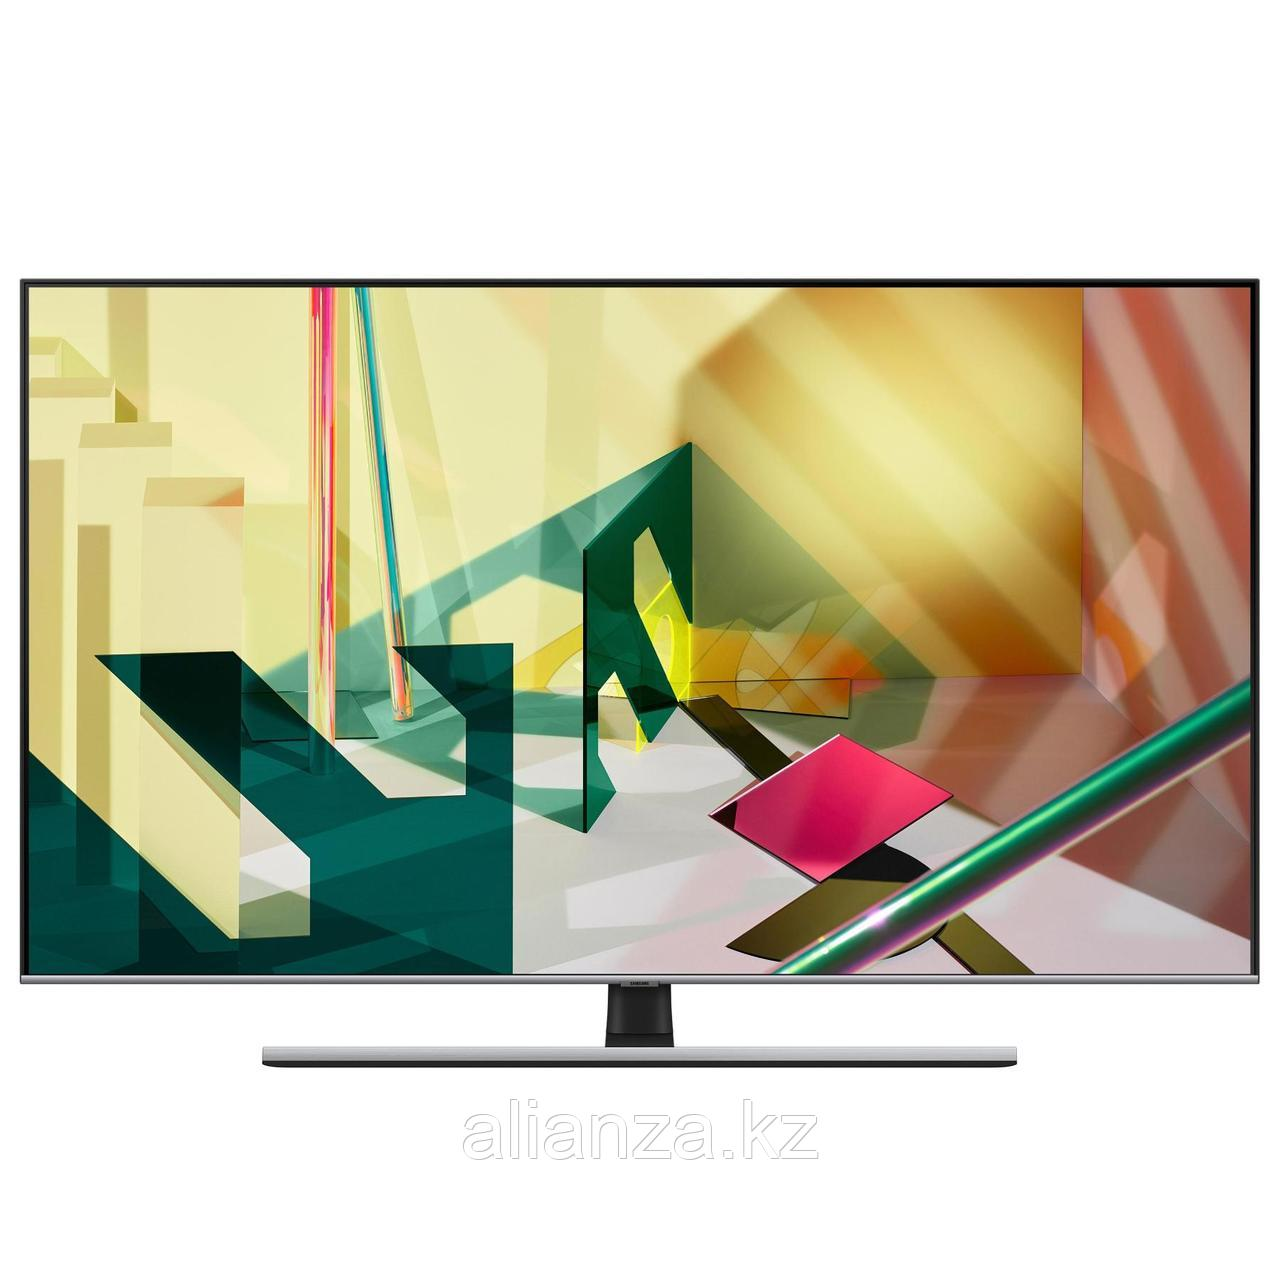 QLED телевизор Samsung QE75Q77TAUXRU